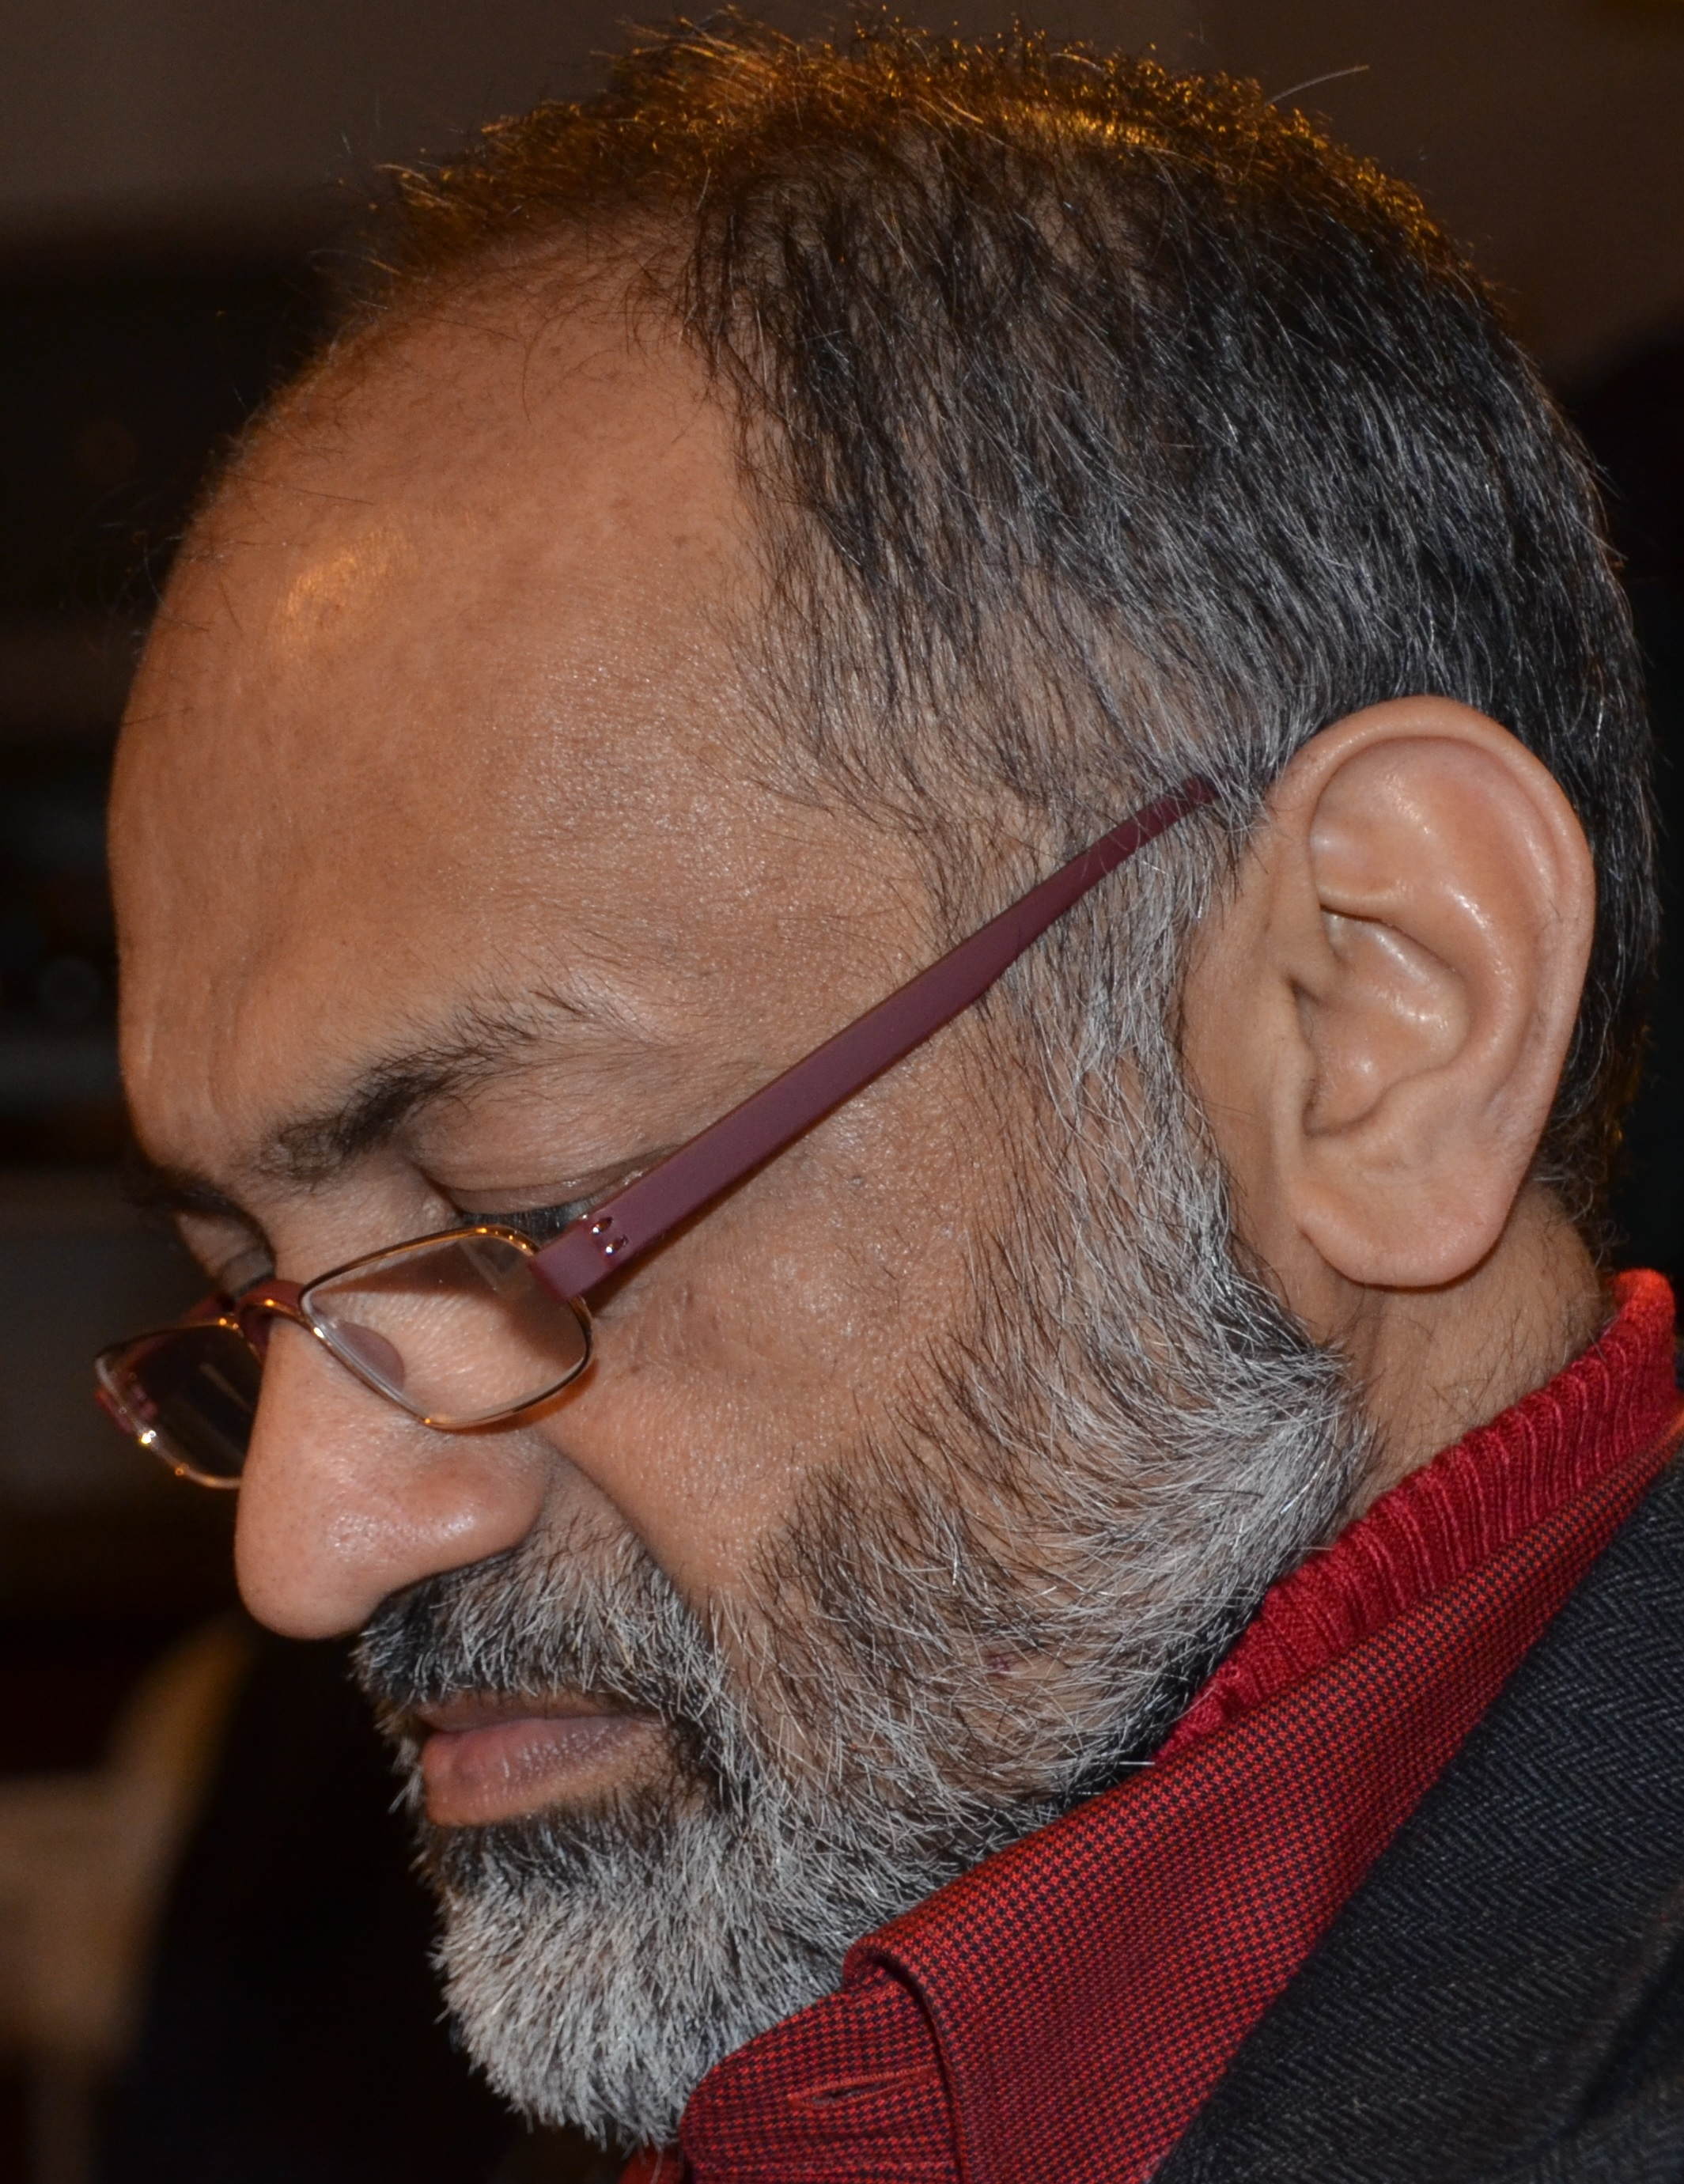 Prathamesh D Popat